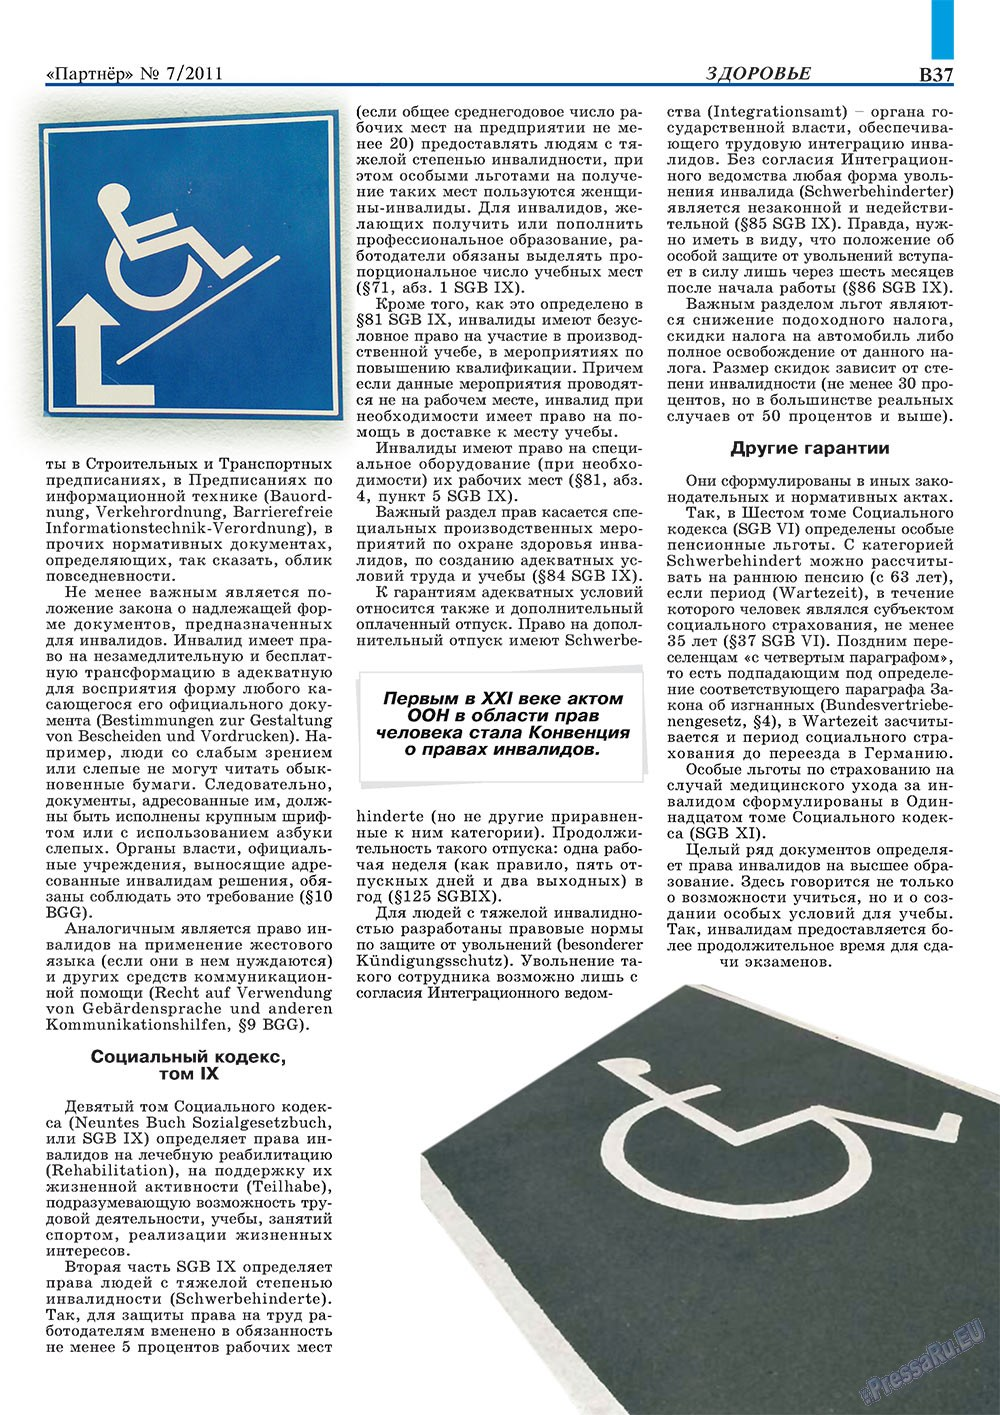 Партнер-север (журнал). 2011 год, номер 7, стр. 47